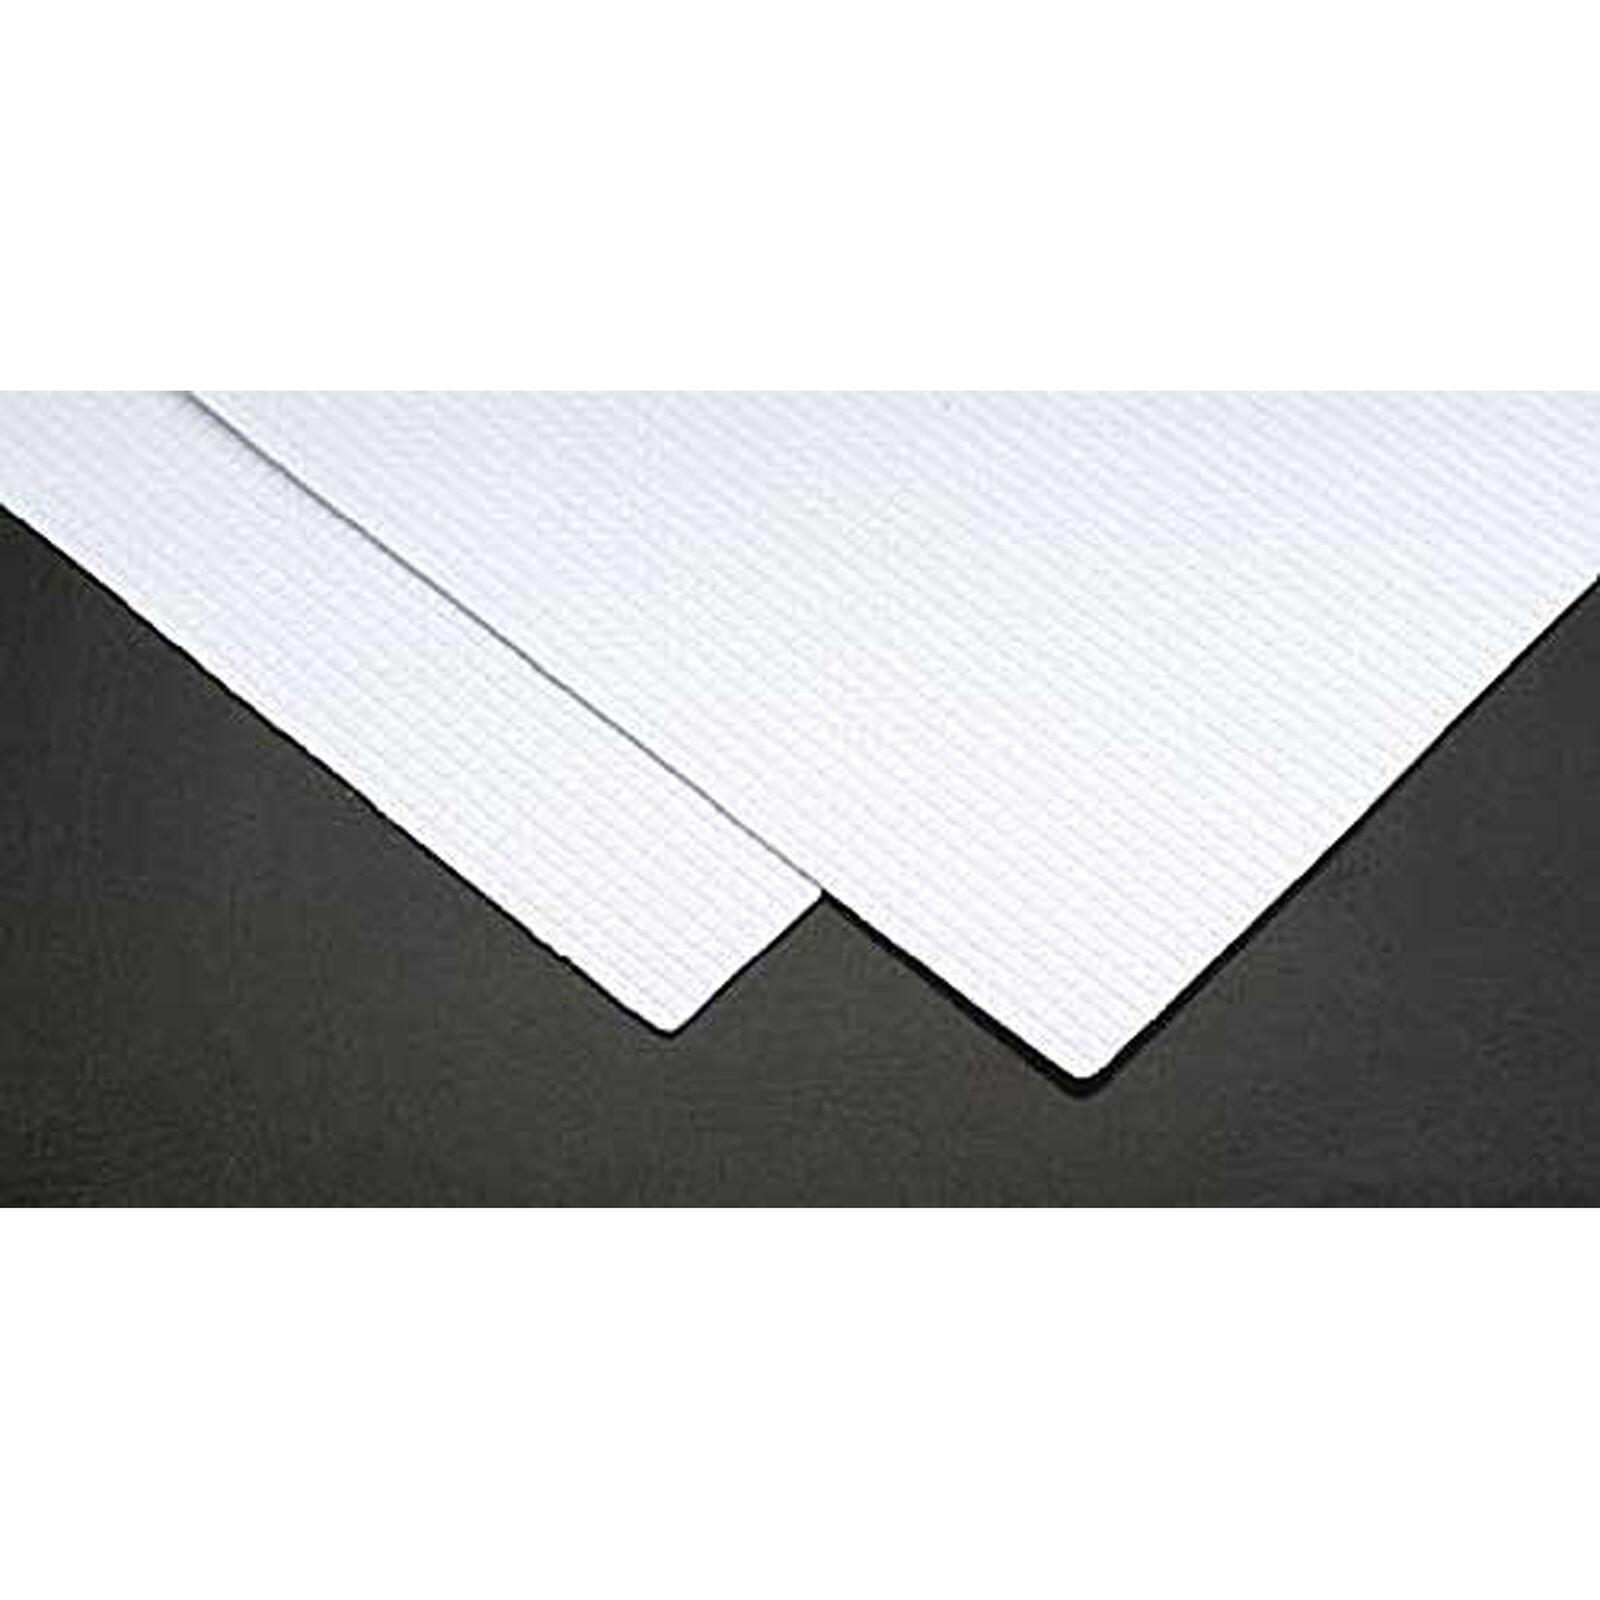 PS-39 Square Tile Sheet, 3.2mm